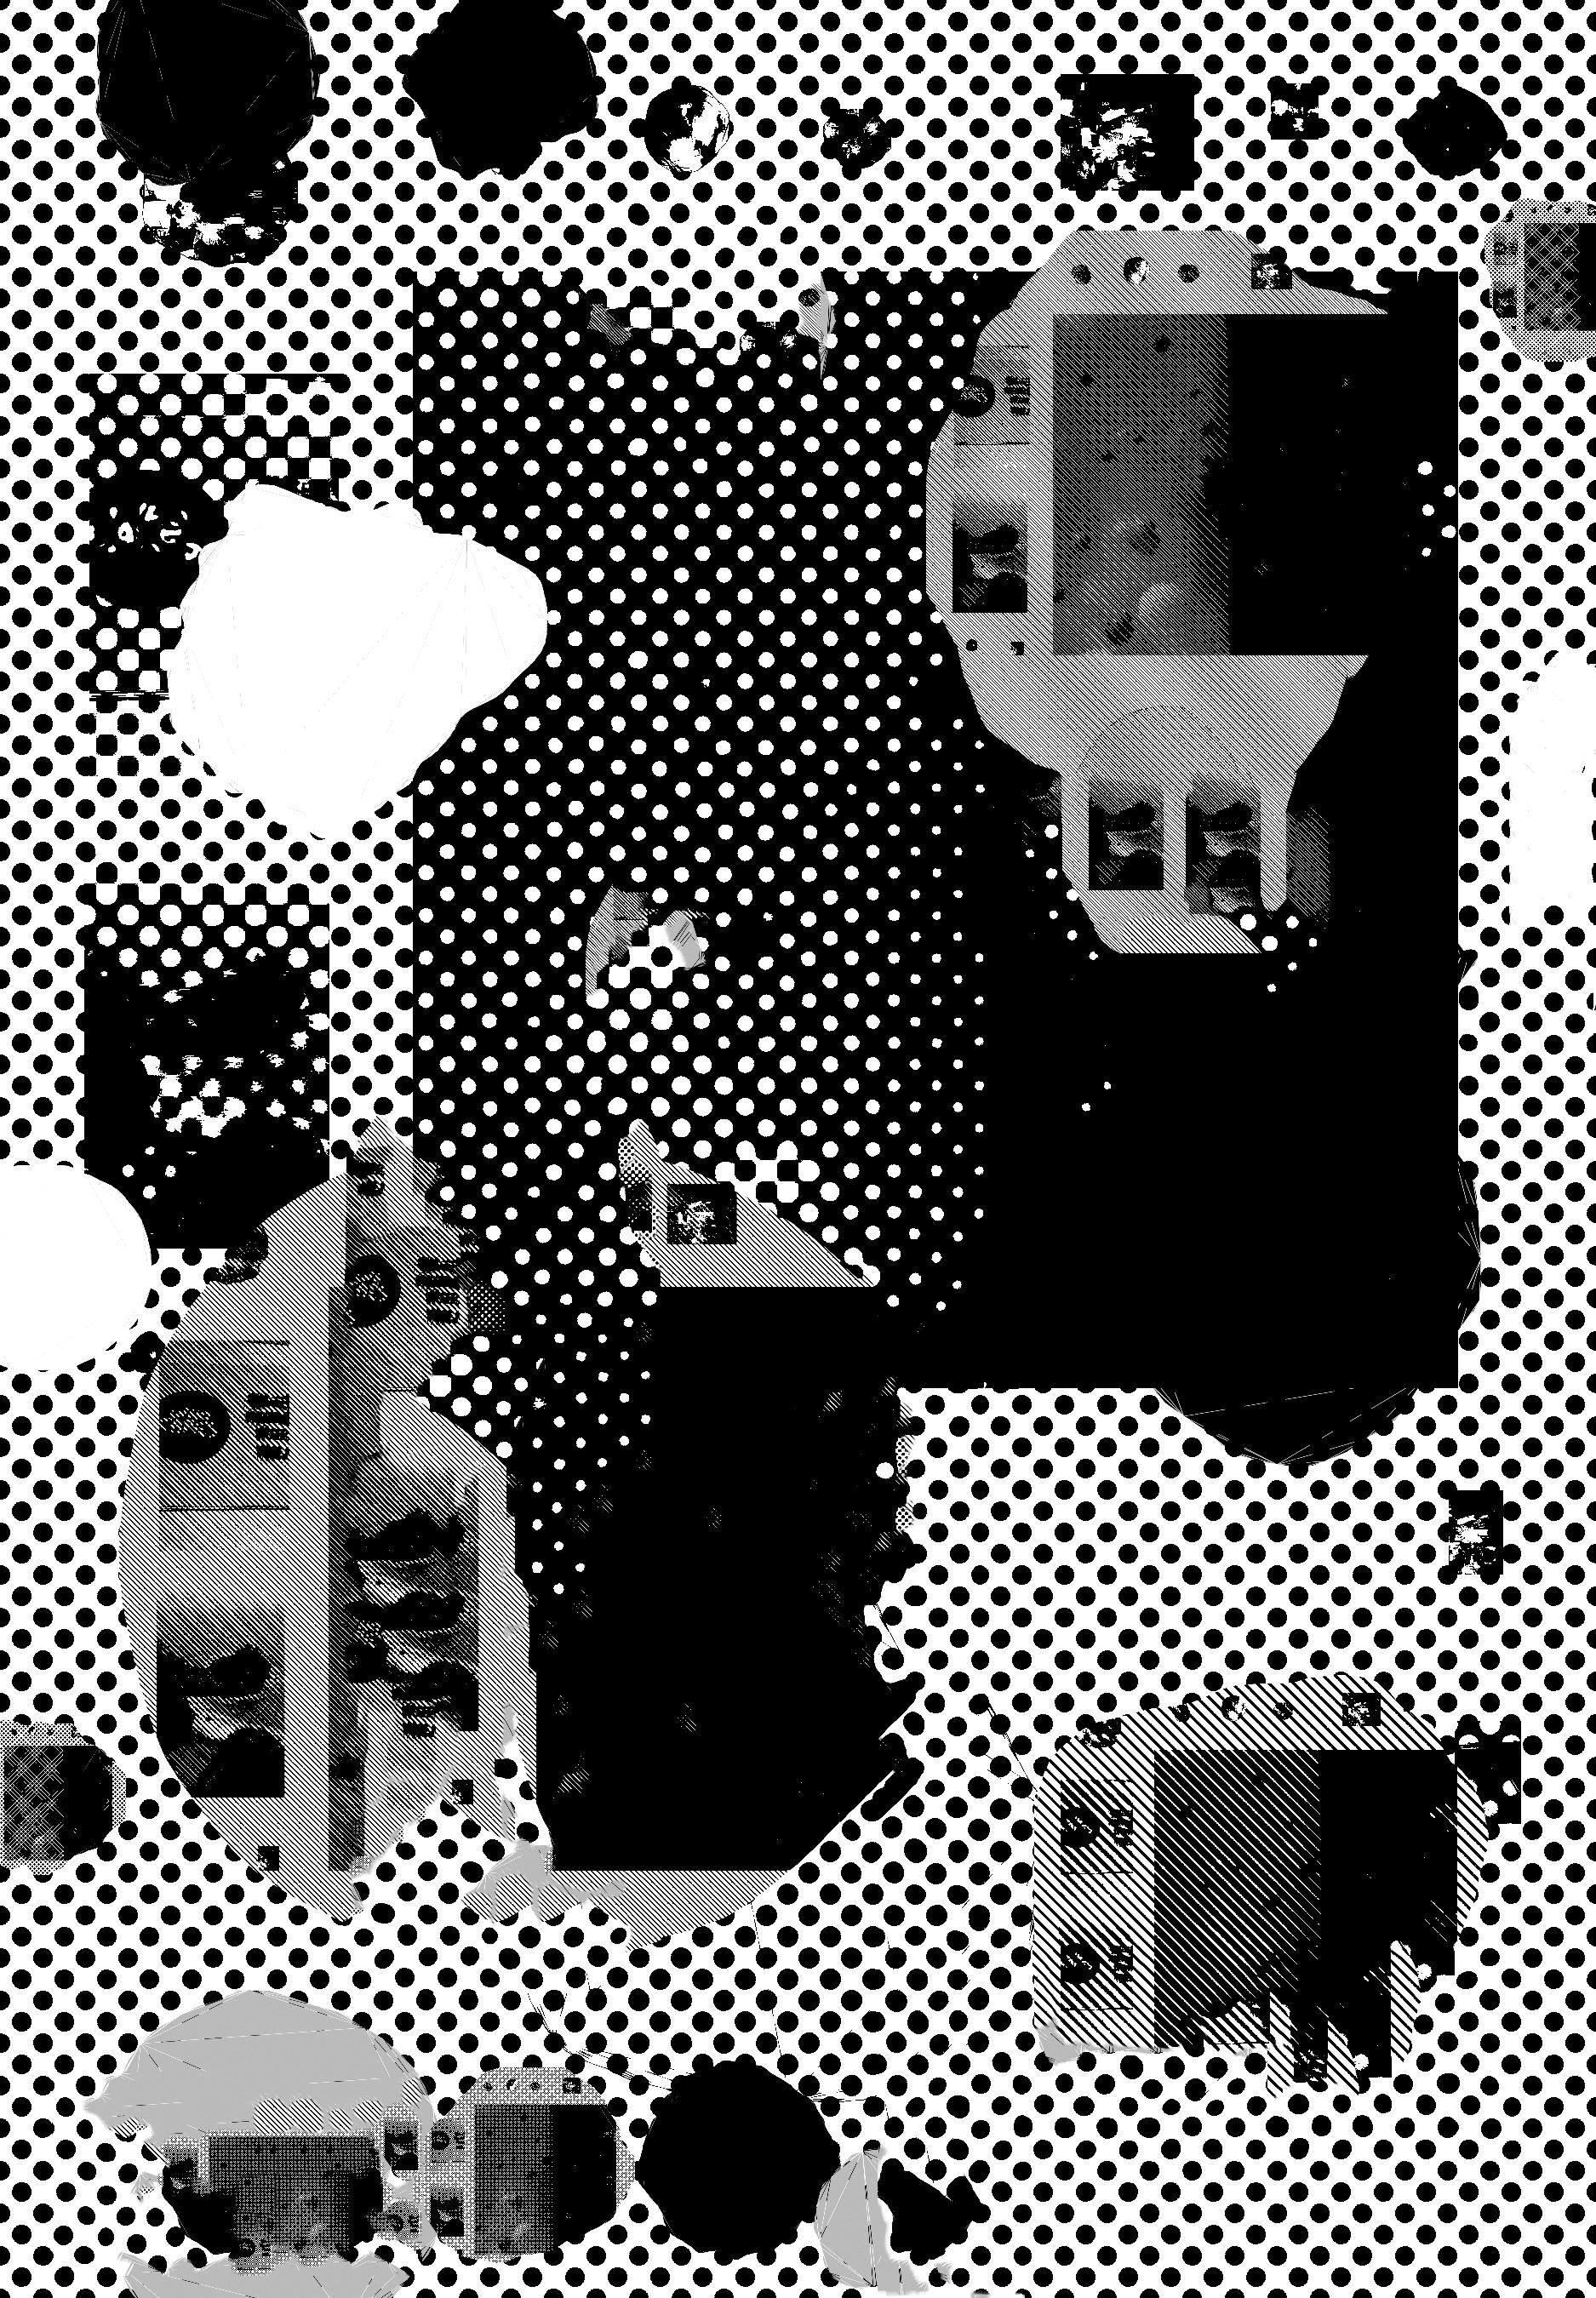 10.Roettinger_cc-2011-7-5-413